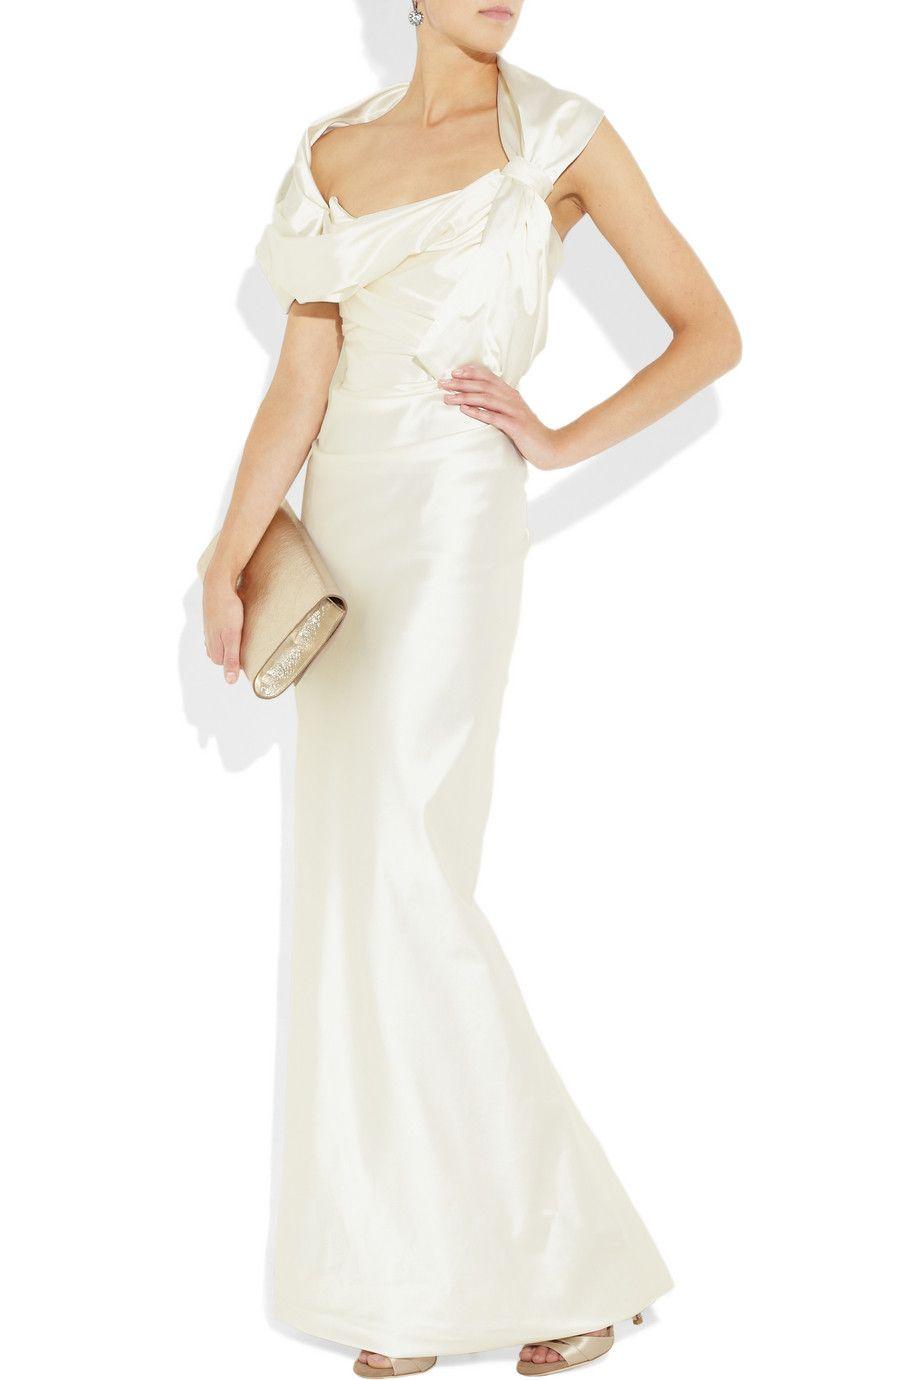 Vivienne Westwood Gold Label Bellini Silk Blend Stretch Satin Gown Net A Porter Com Satin Gown Vivienne Westwood Wedding Dress Stretch Satin [ 1380 x 920 Pixel ]